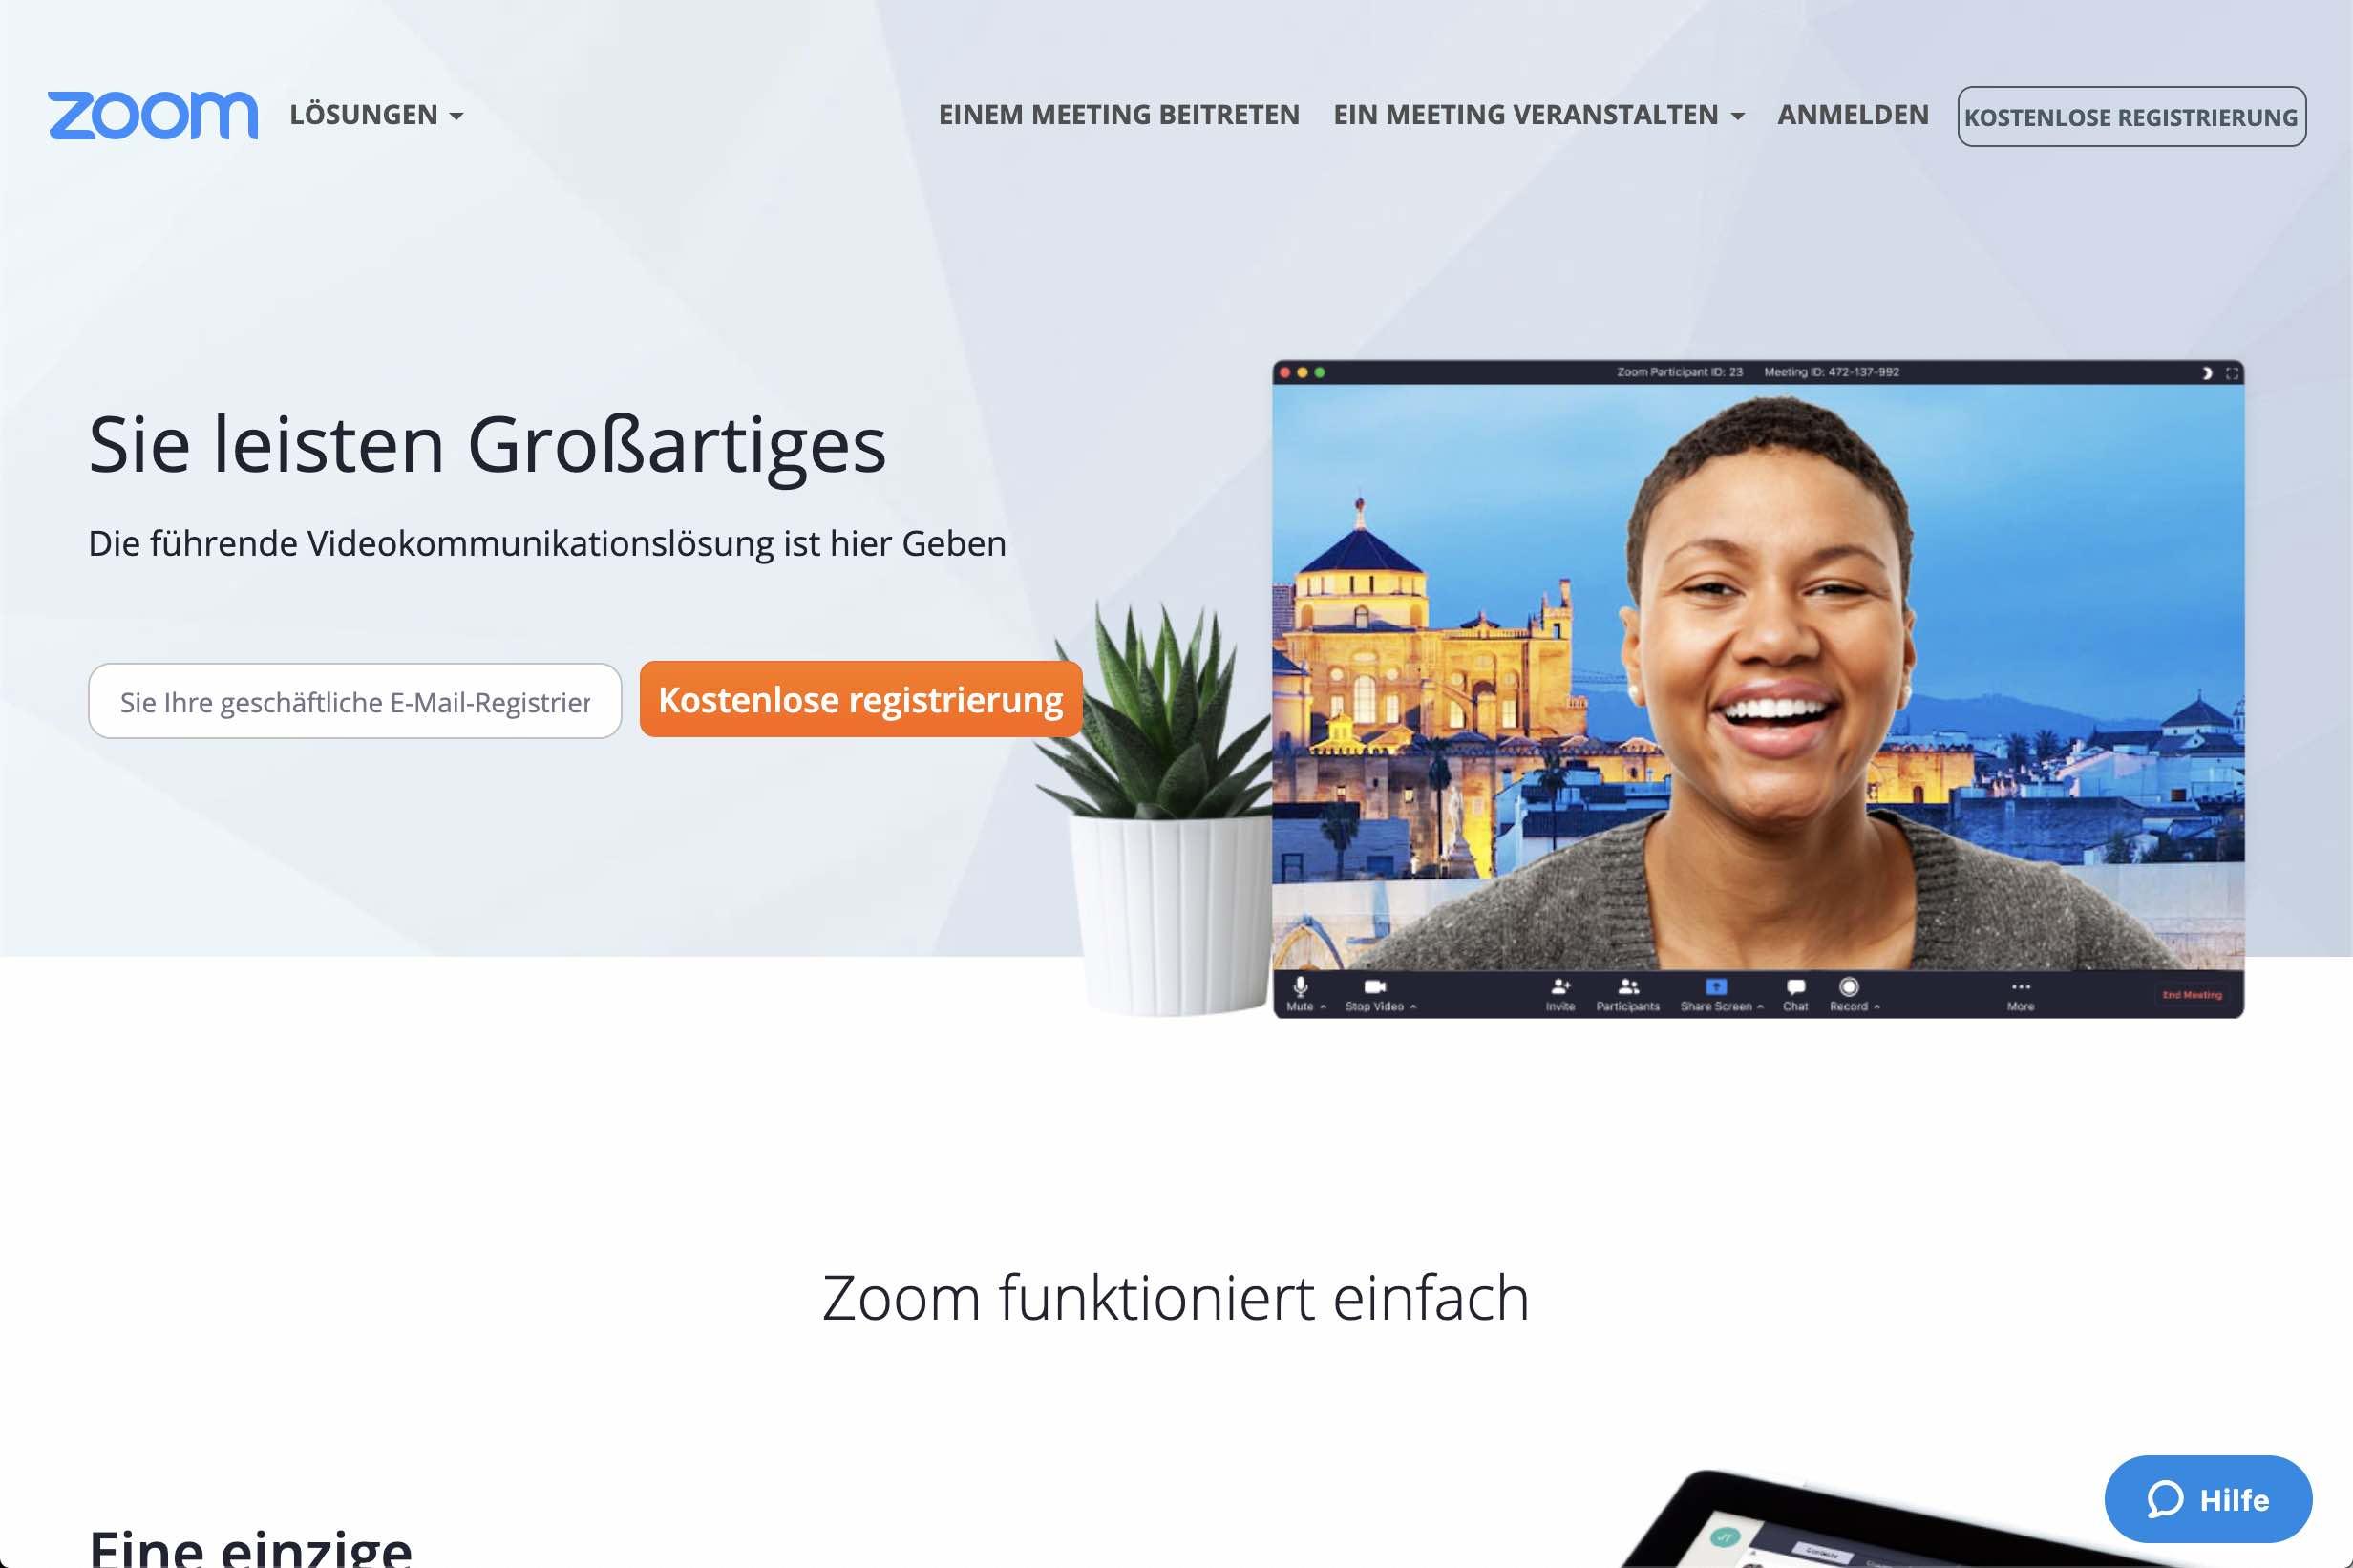 zoom-us web meeting anwendung